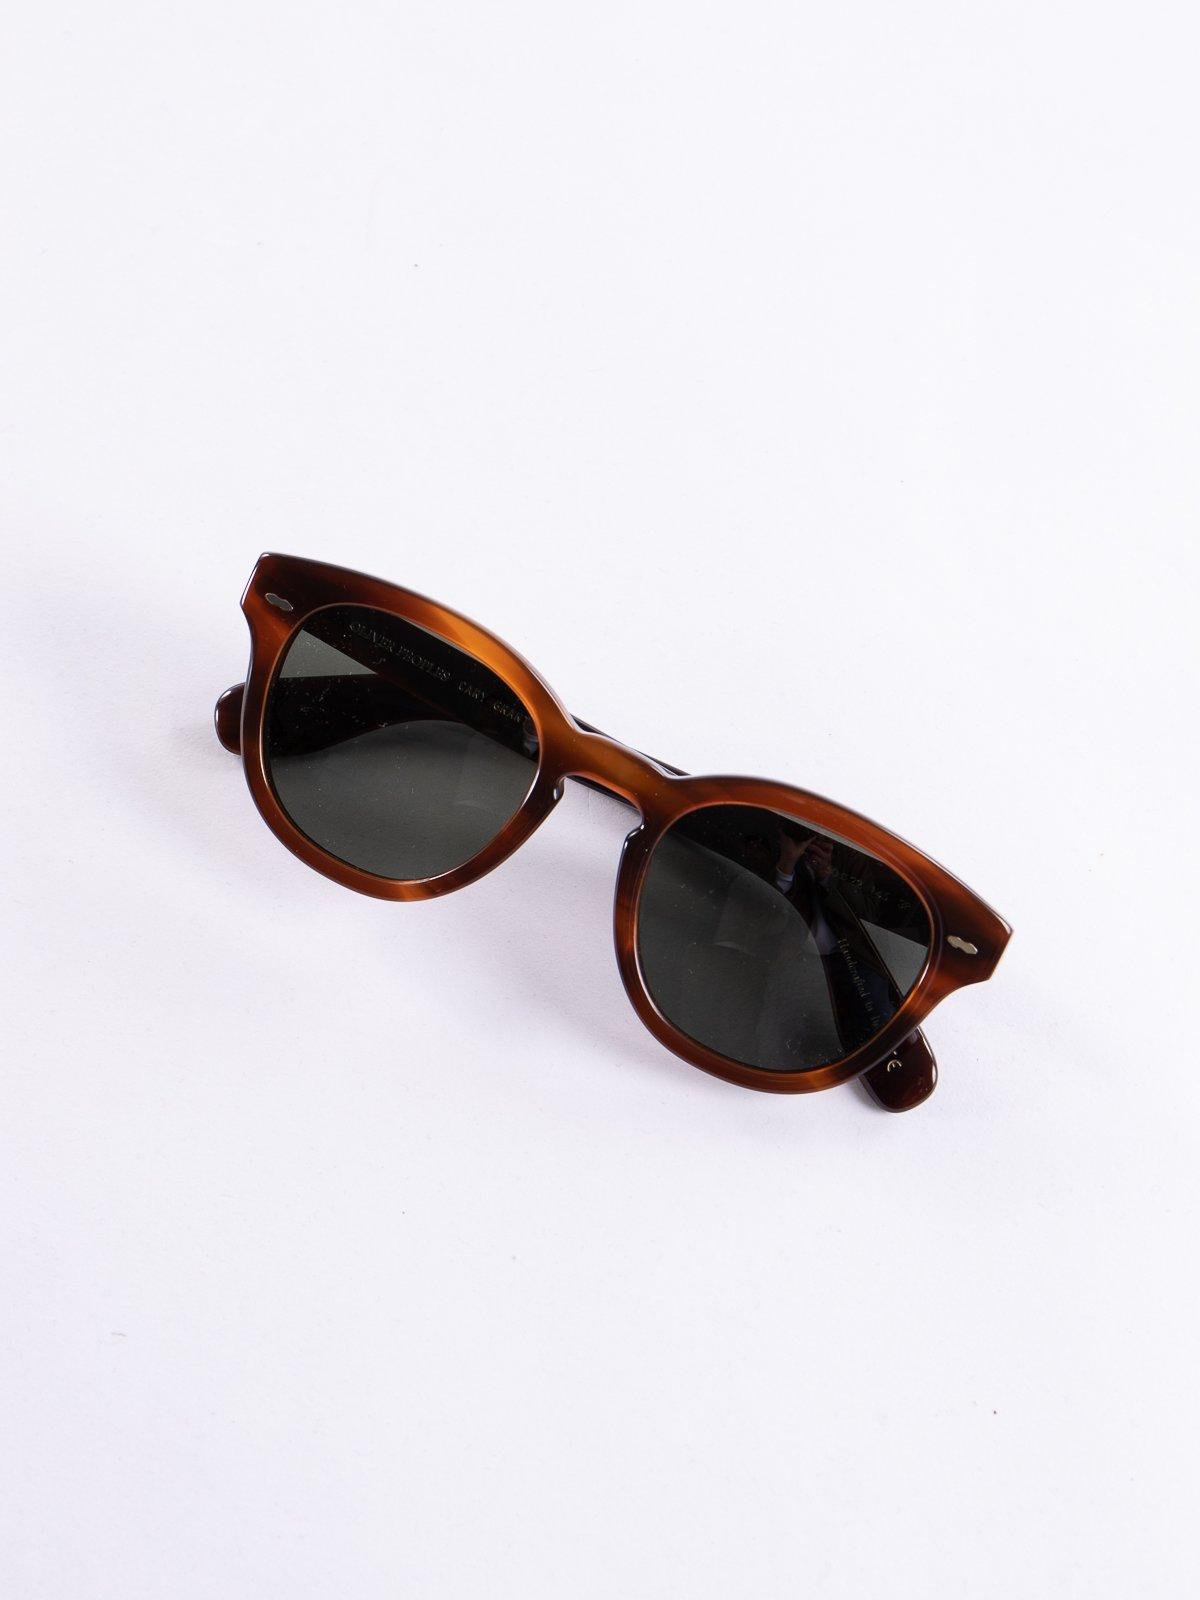 Grant Tortoise/G–15 Polar Cary Grant Sunglasses - Image 1